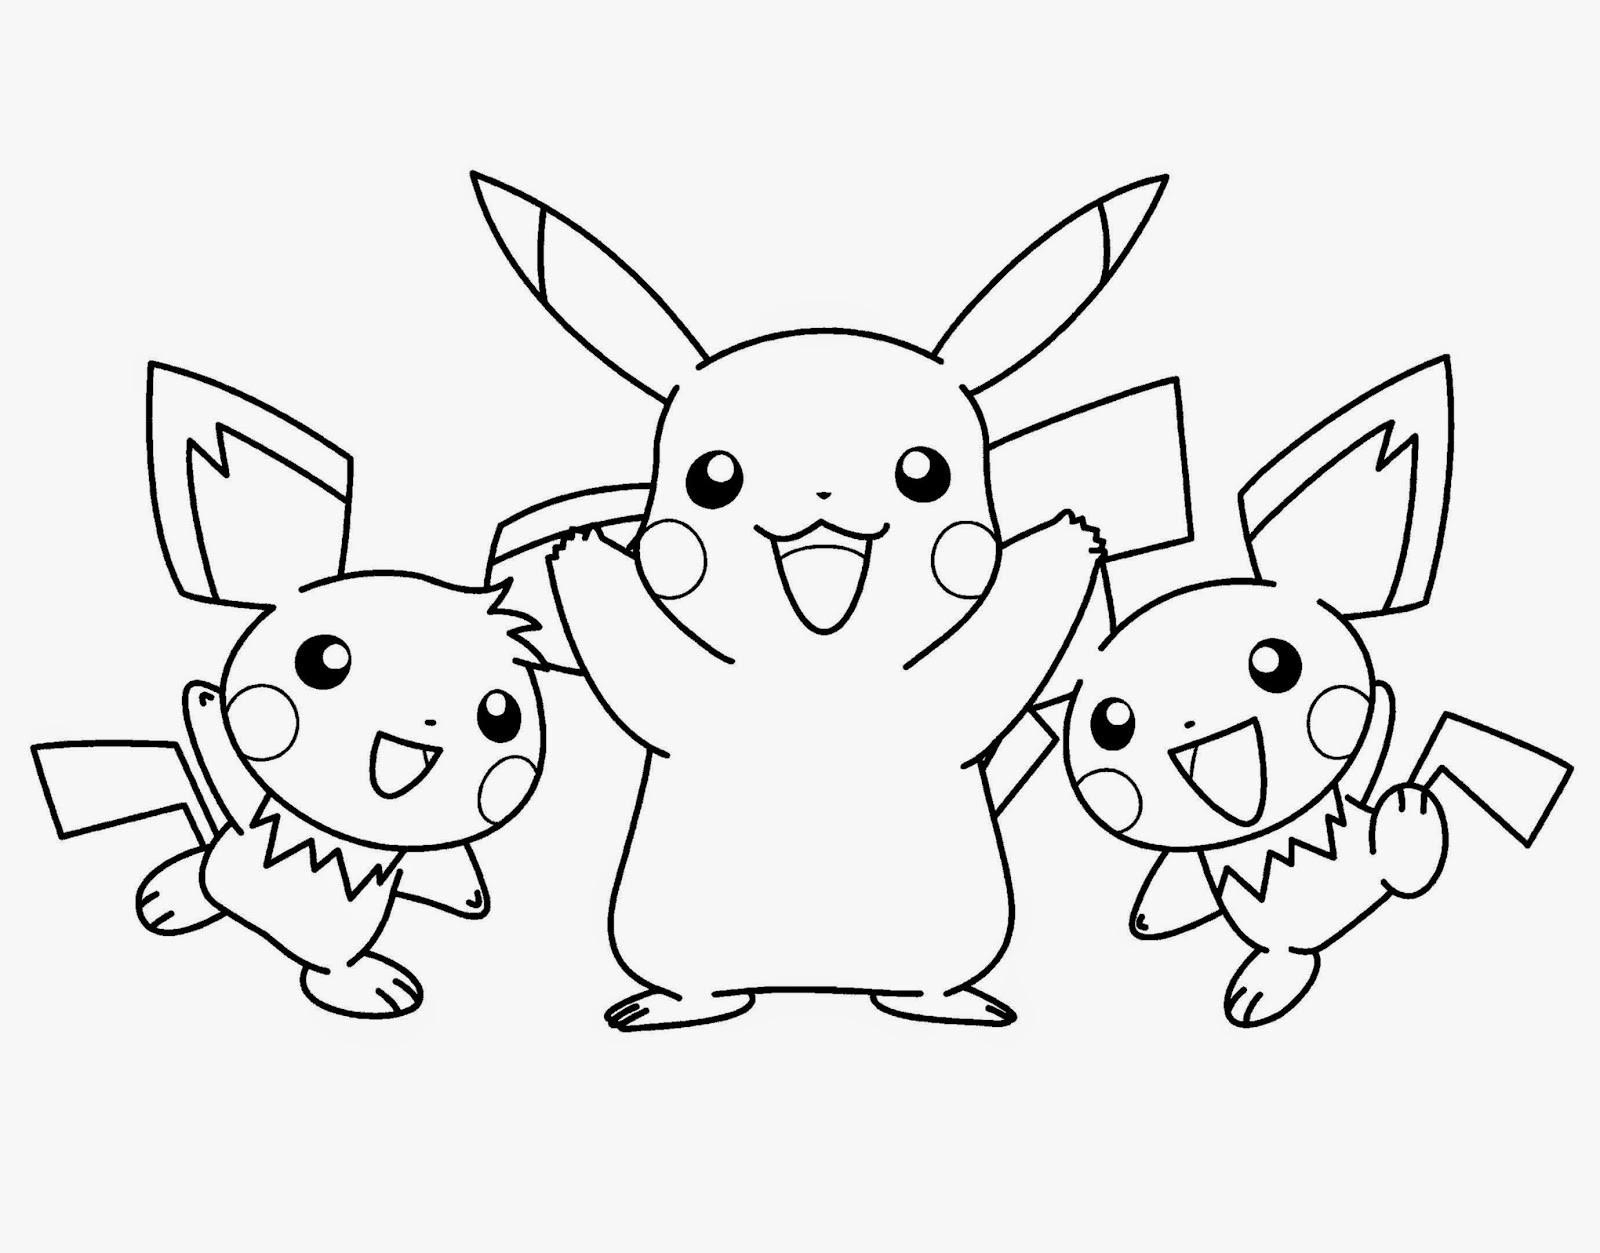 Pokemon Printable Coloring Pages  Pokemon Coloring Sheets